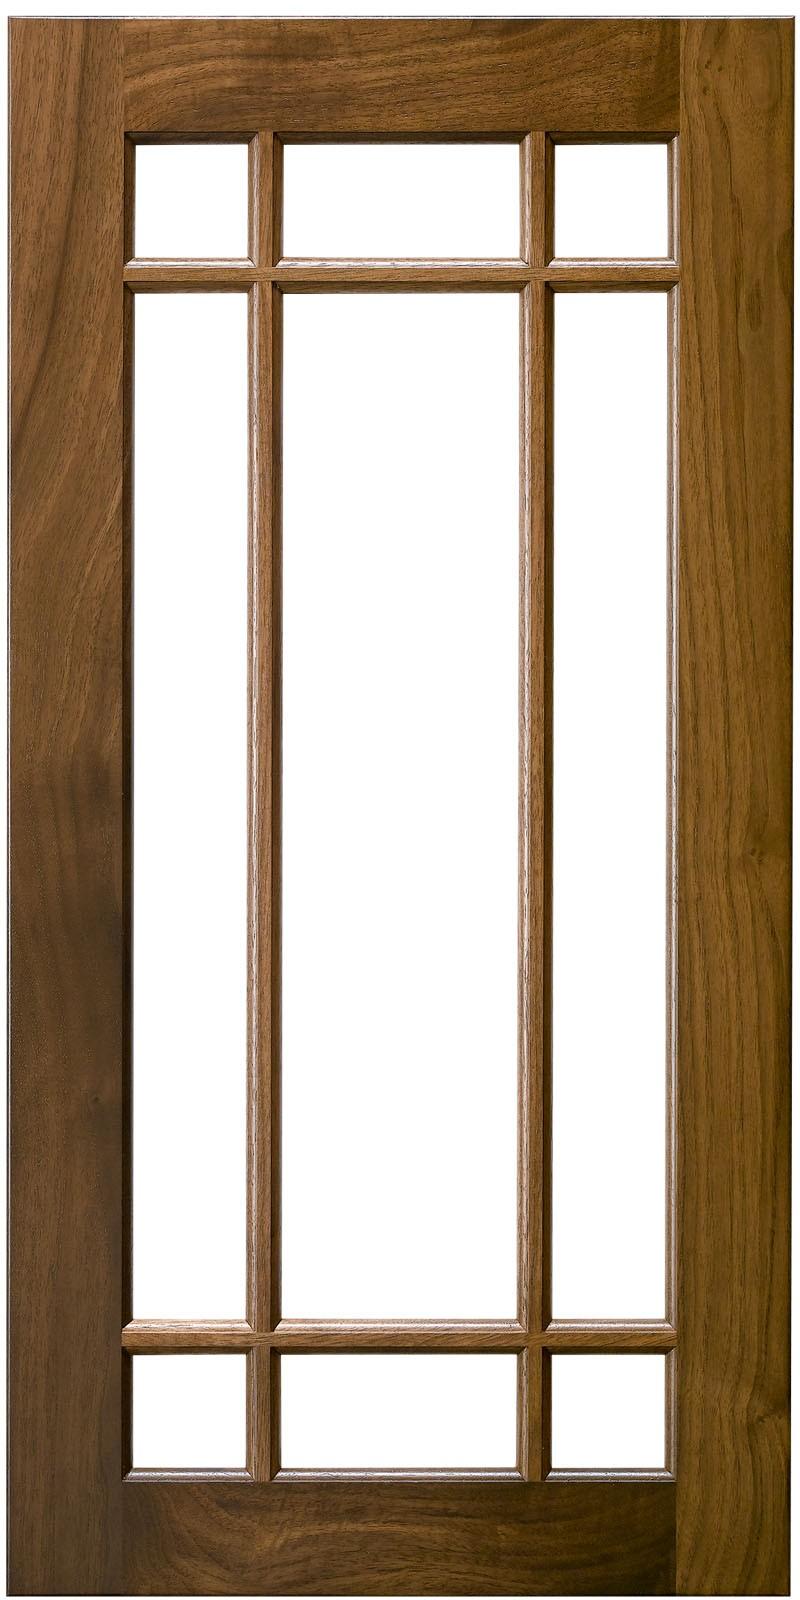 9 Lite Offset Mullion Doors Construction Cabinet